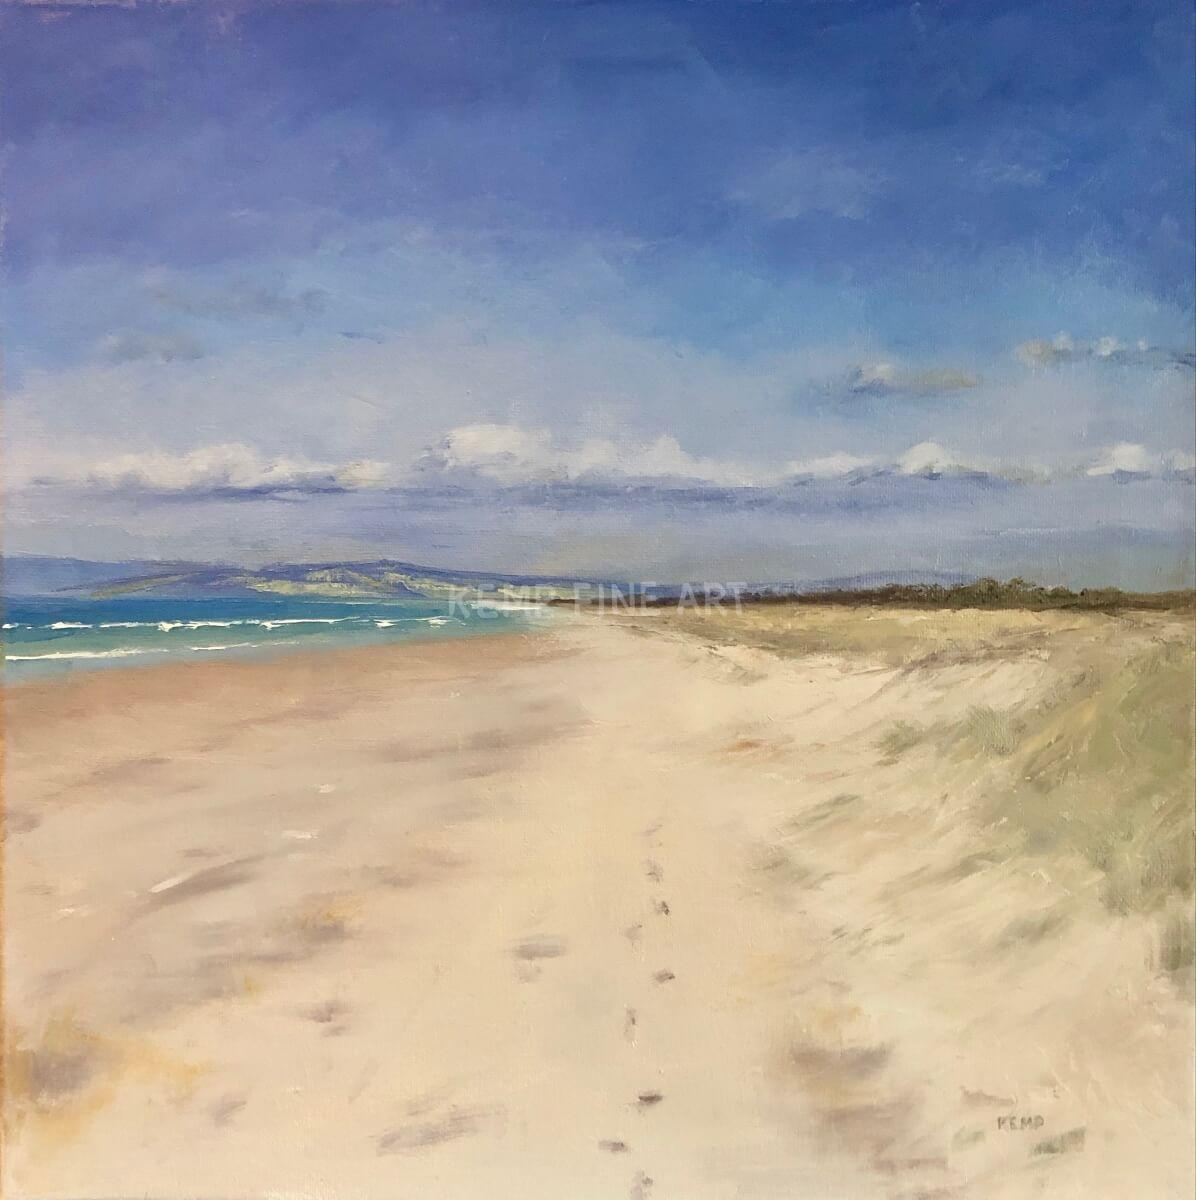 Ruakaka Beach, New Zealand | Oil on Canvas - by Jim Kemp